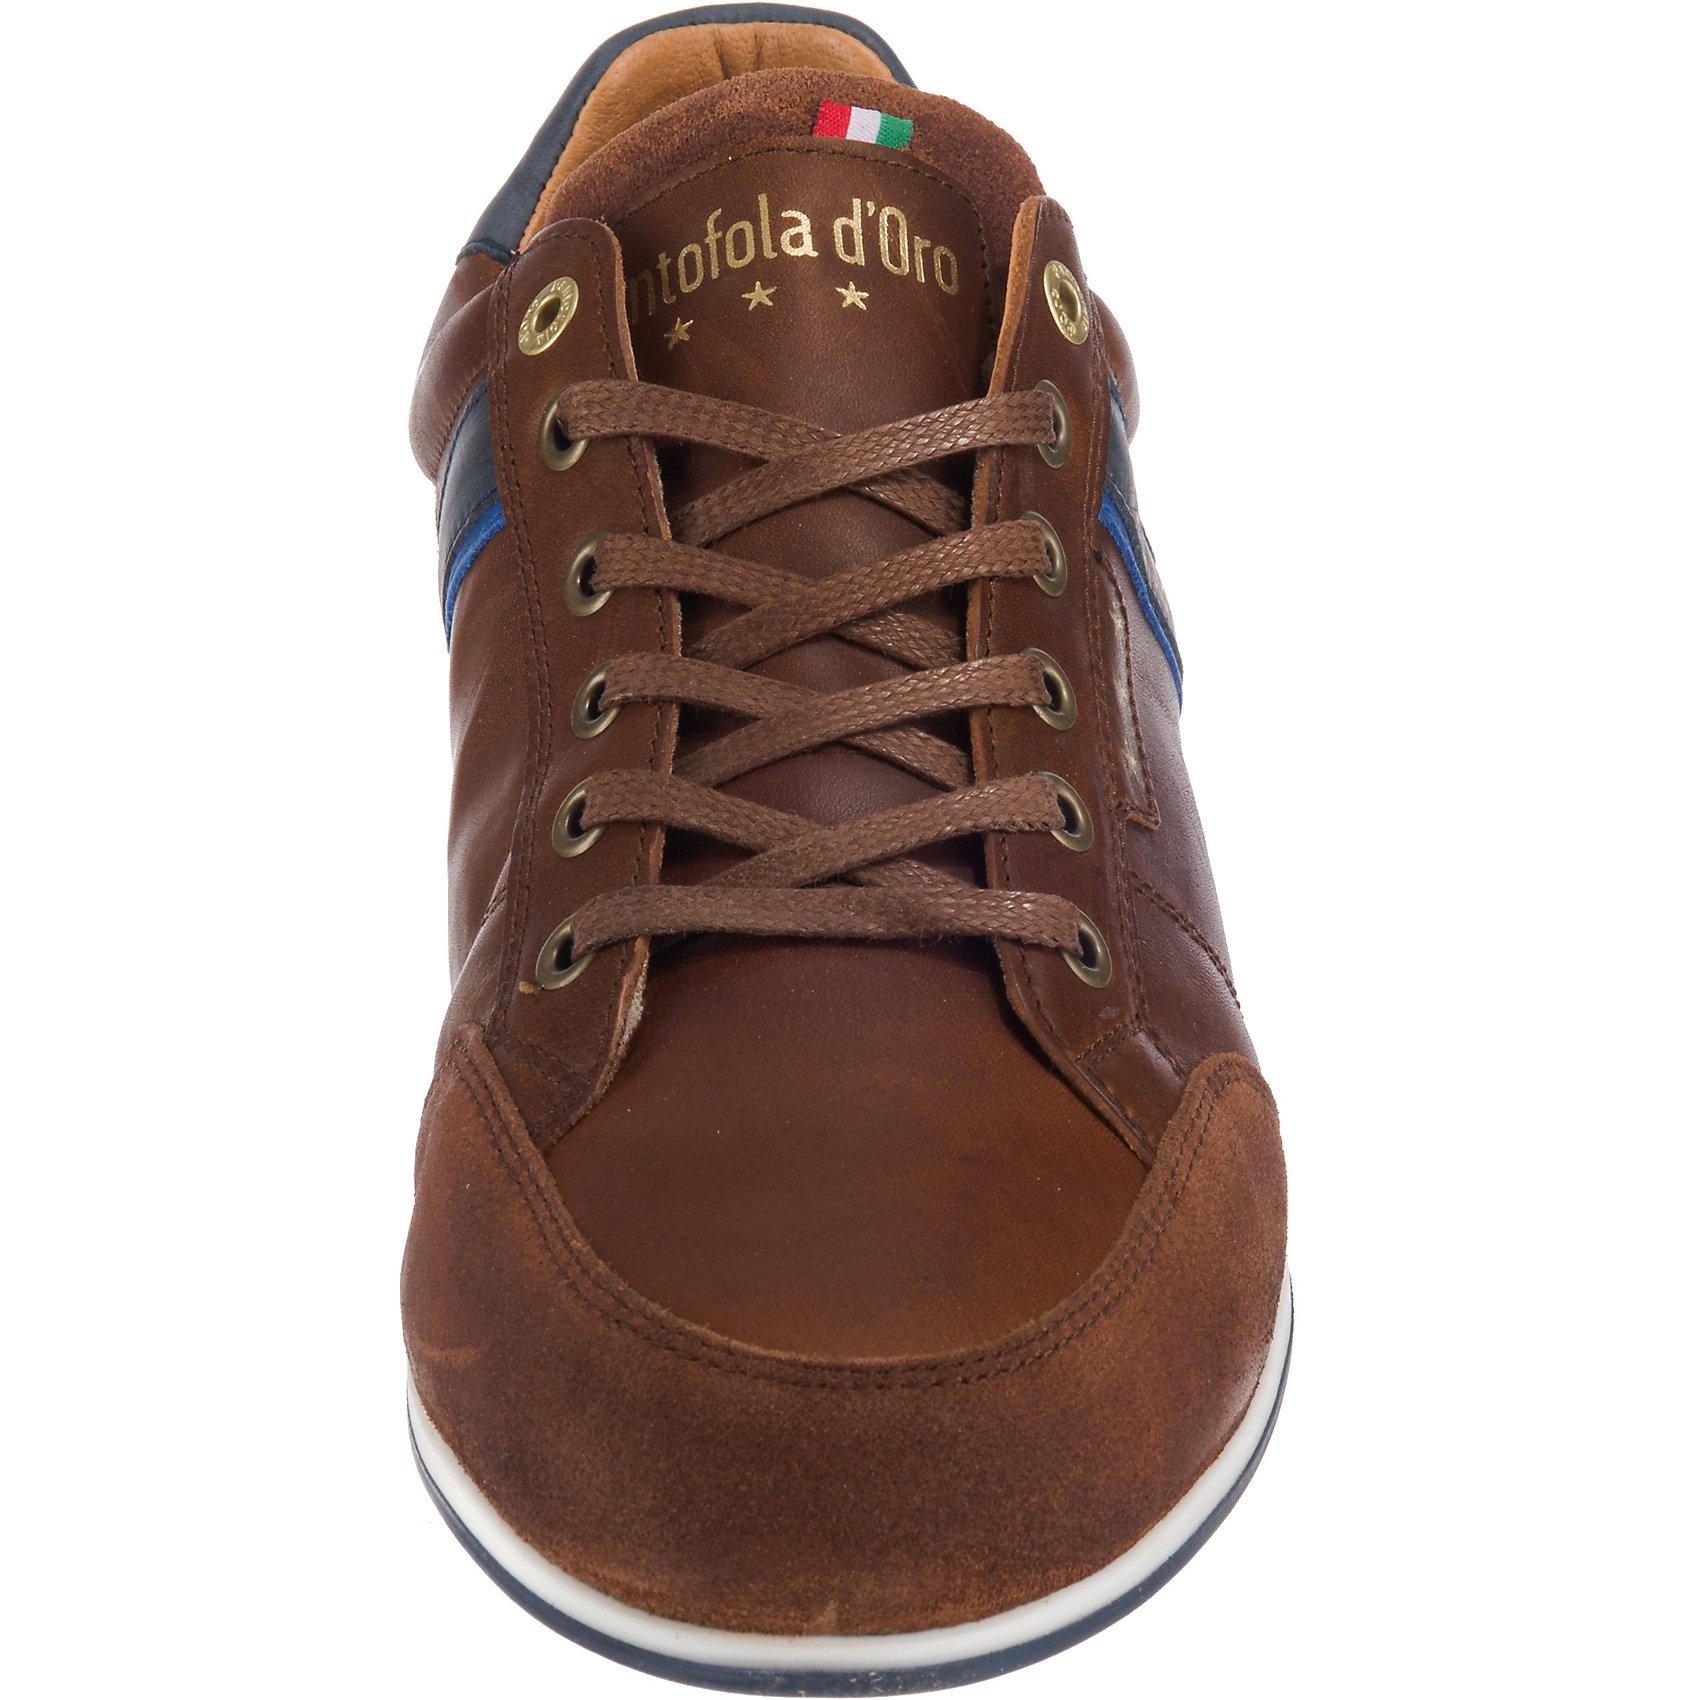 Neu Pantofola Low d'Oro ROMA UOMO LOW Sneakers Low Pantofola 7283287 für Herren 0c4d77